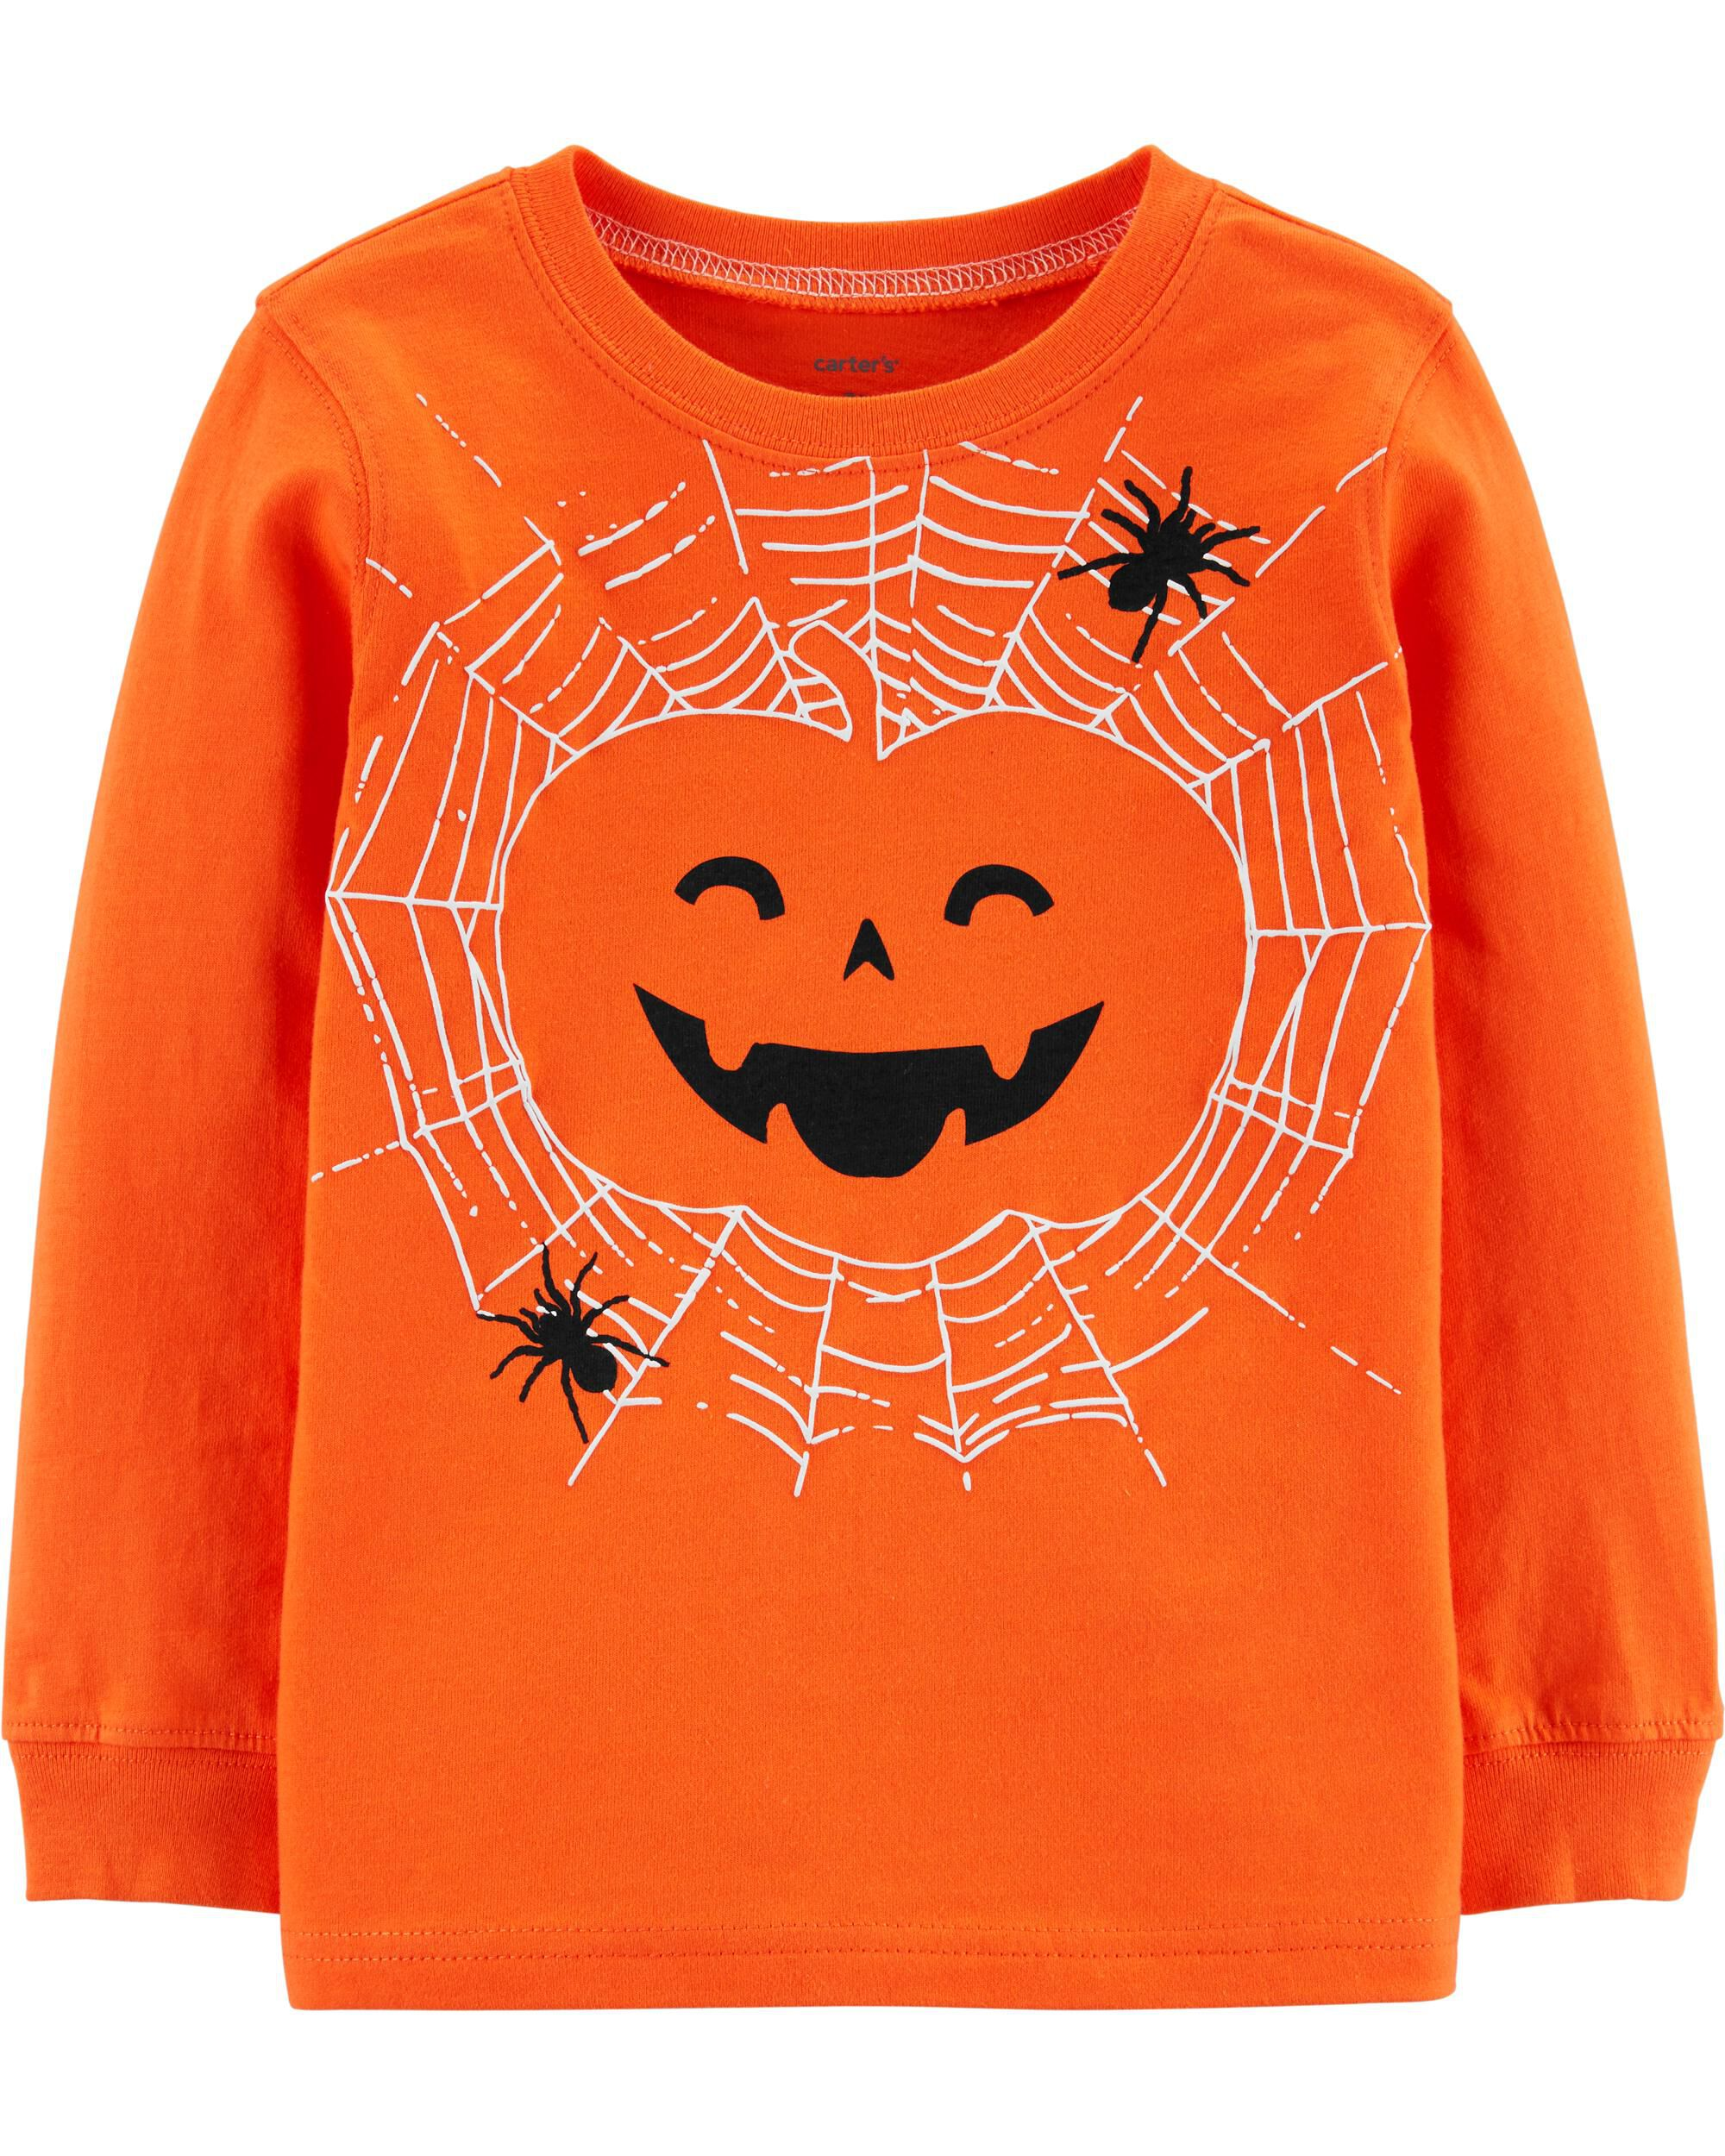 *CLEARANCE* Halloween Jack-O-Lantern Jersey Tee